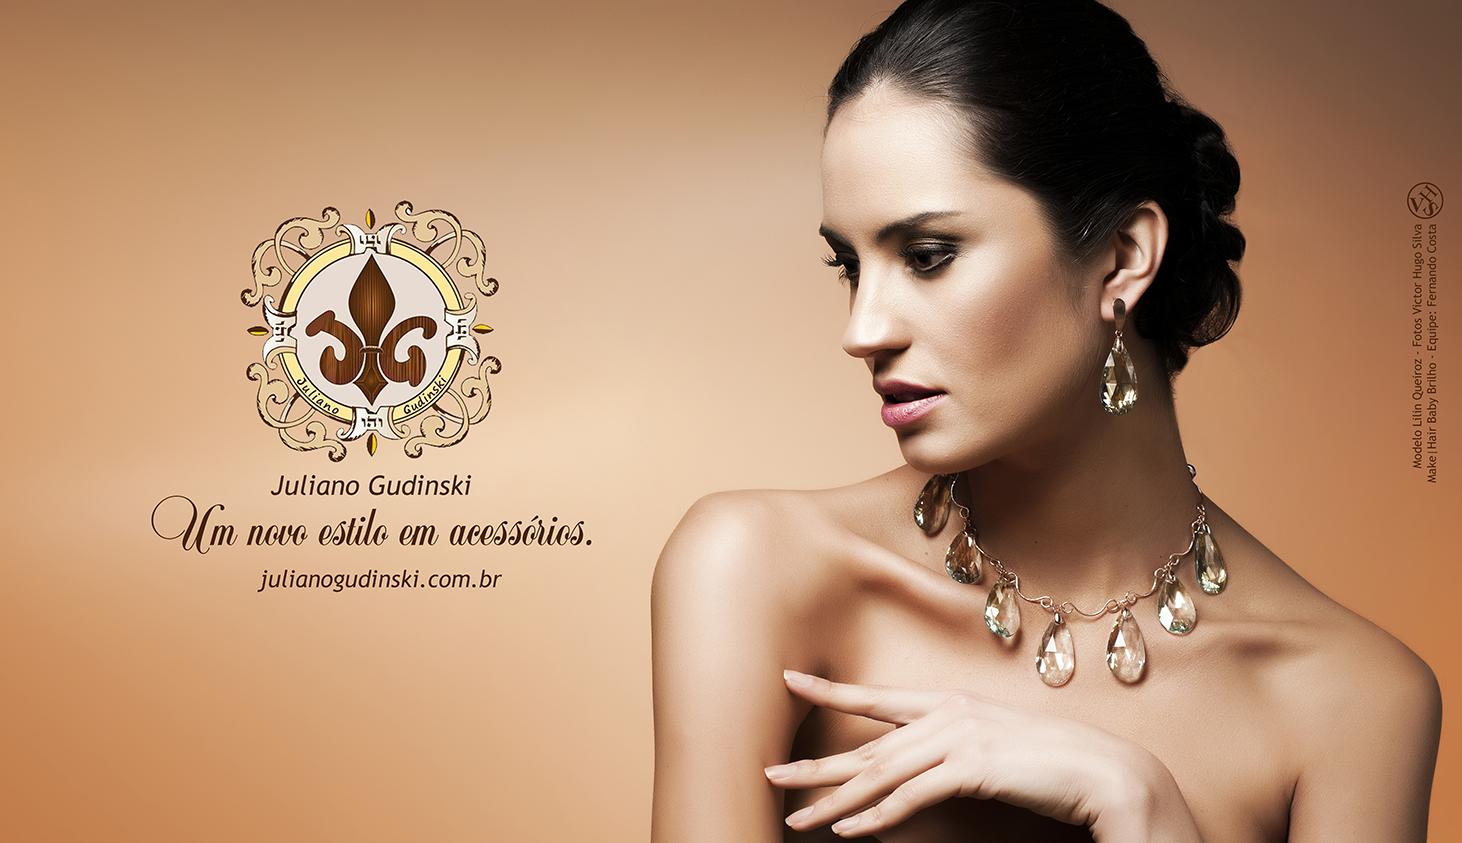 lilian queiroz por victor hugo silva joias juliano gudinski 2 - Copia.jpg